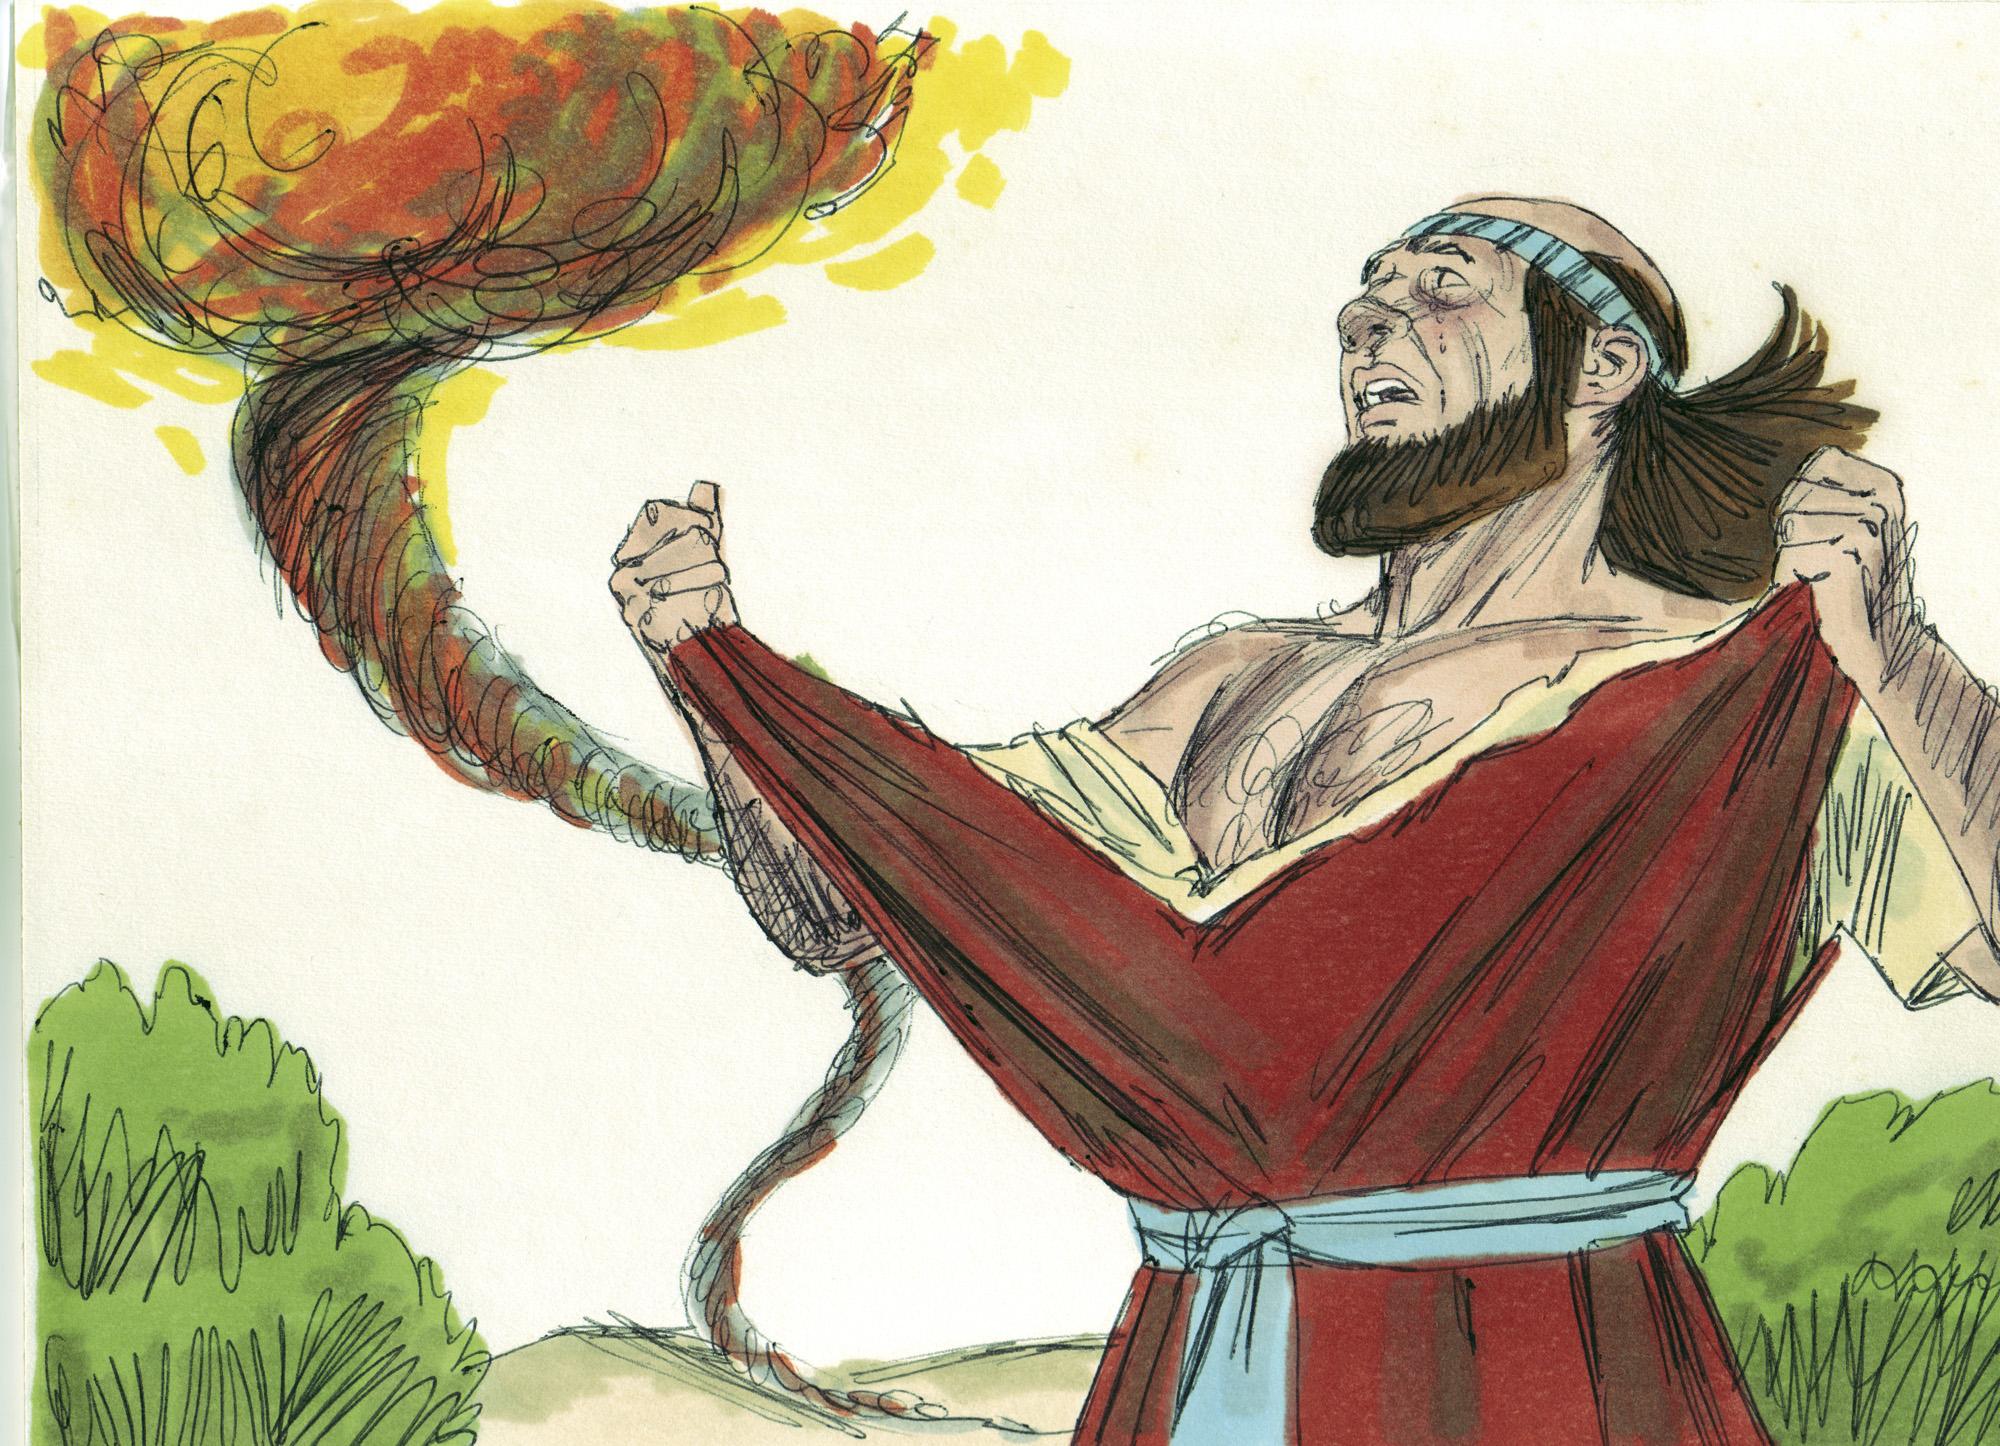 elijah and elisha God gives us friends - elijah and elisha bible lesson the following crafts and activities come from the lesson god gives us friends about elijah and elisha a.